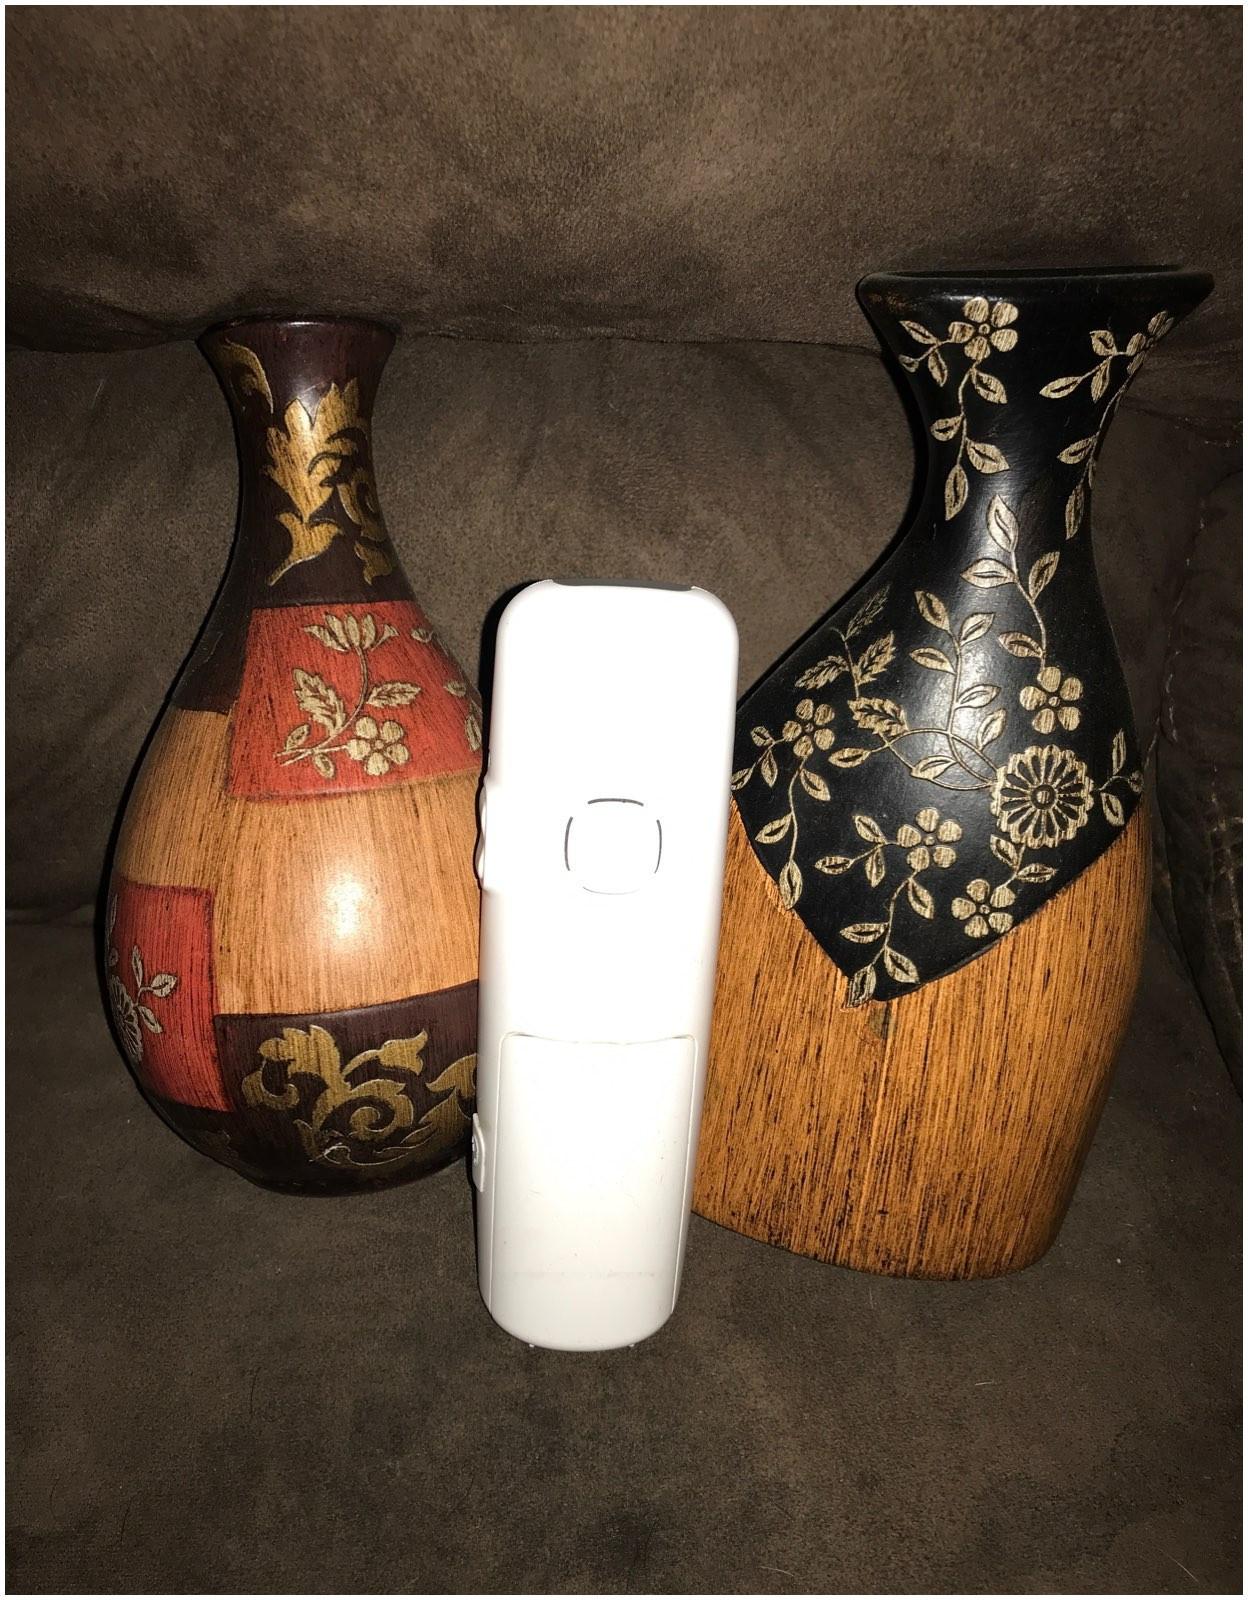 26 Stylish Big Vases Amazon 2021 free download big vases amazon of 21 beau decorative vases anciendemutu org inside 61hl2 2bheixl sl1200 h vases small decorative amazon glass colored bottles unique vase g171f aqua 3